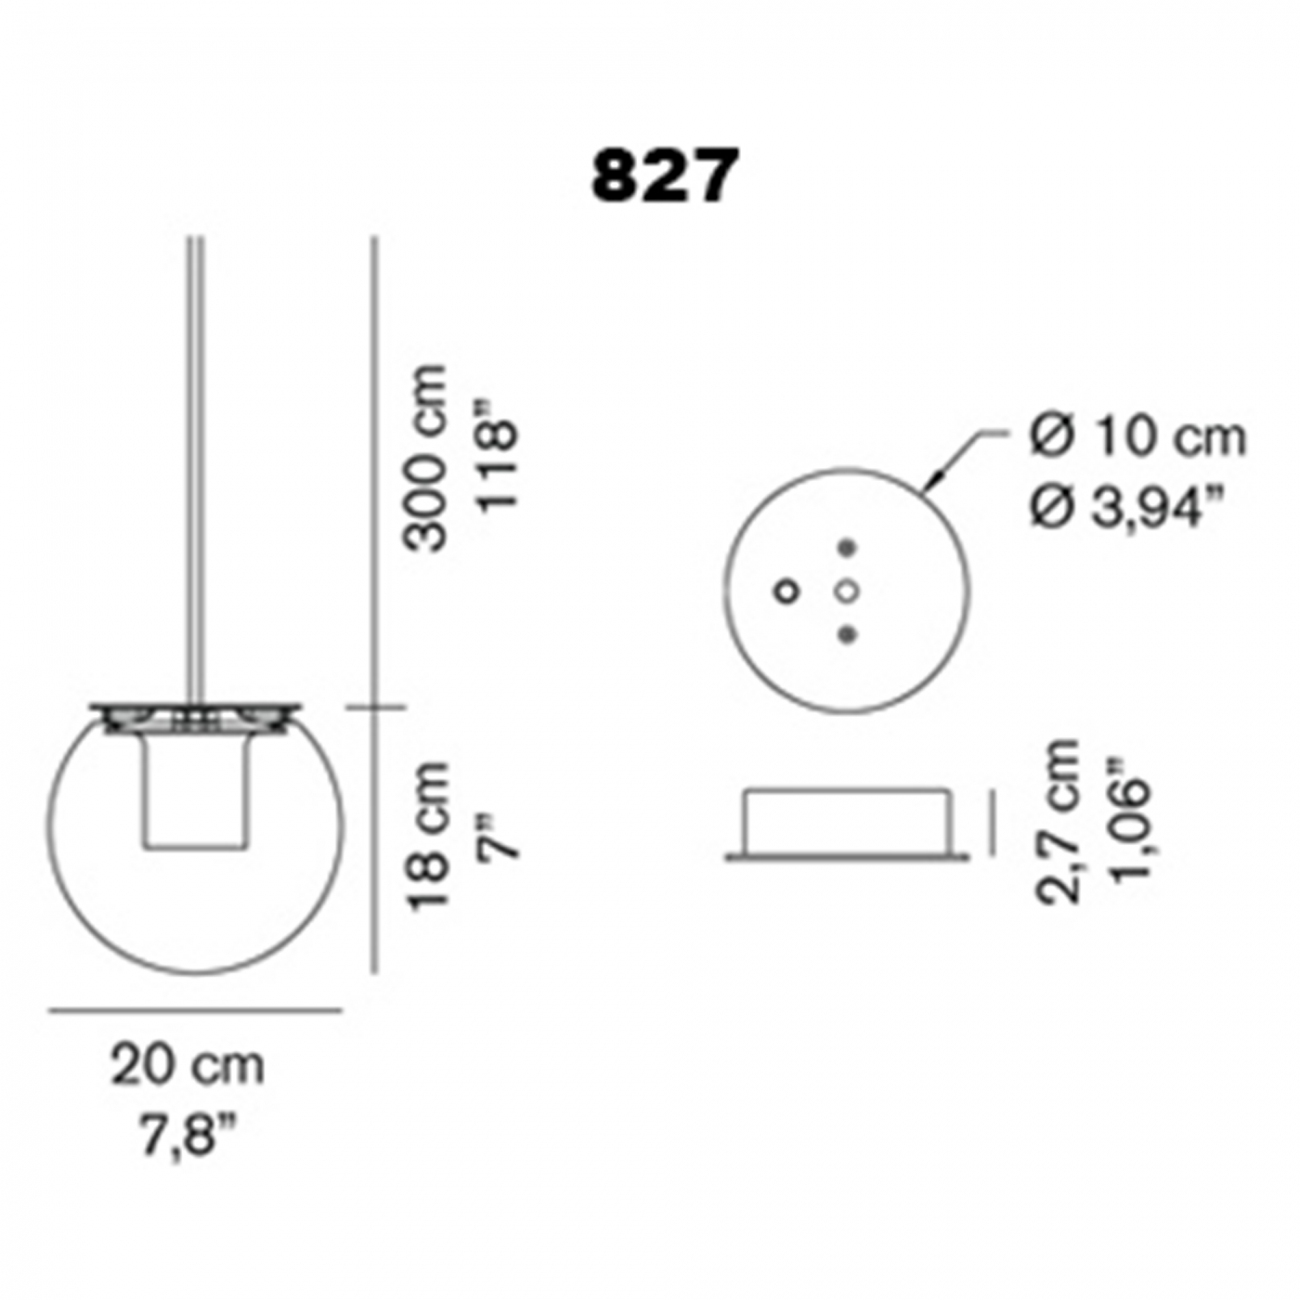 OLuce The Globe 827 Suspension lamp